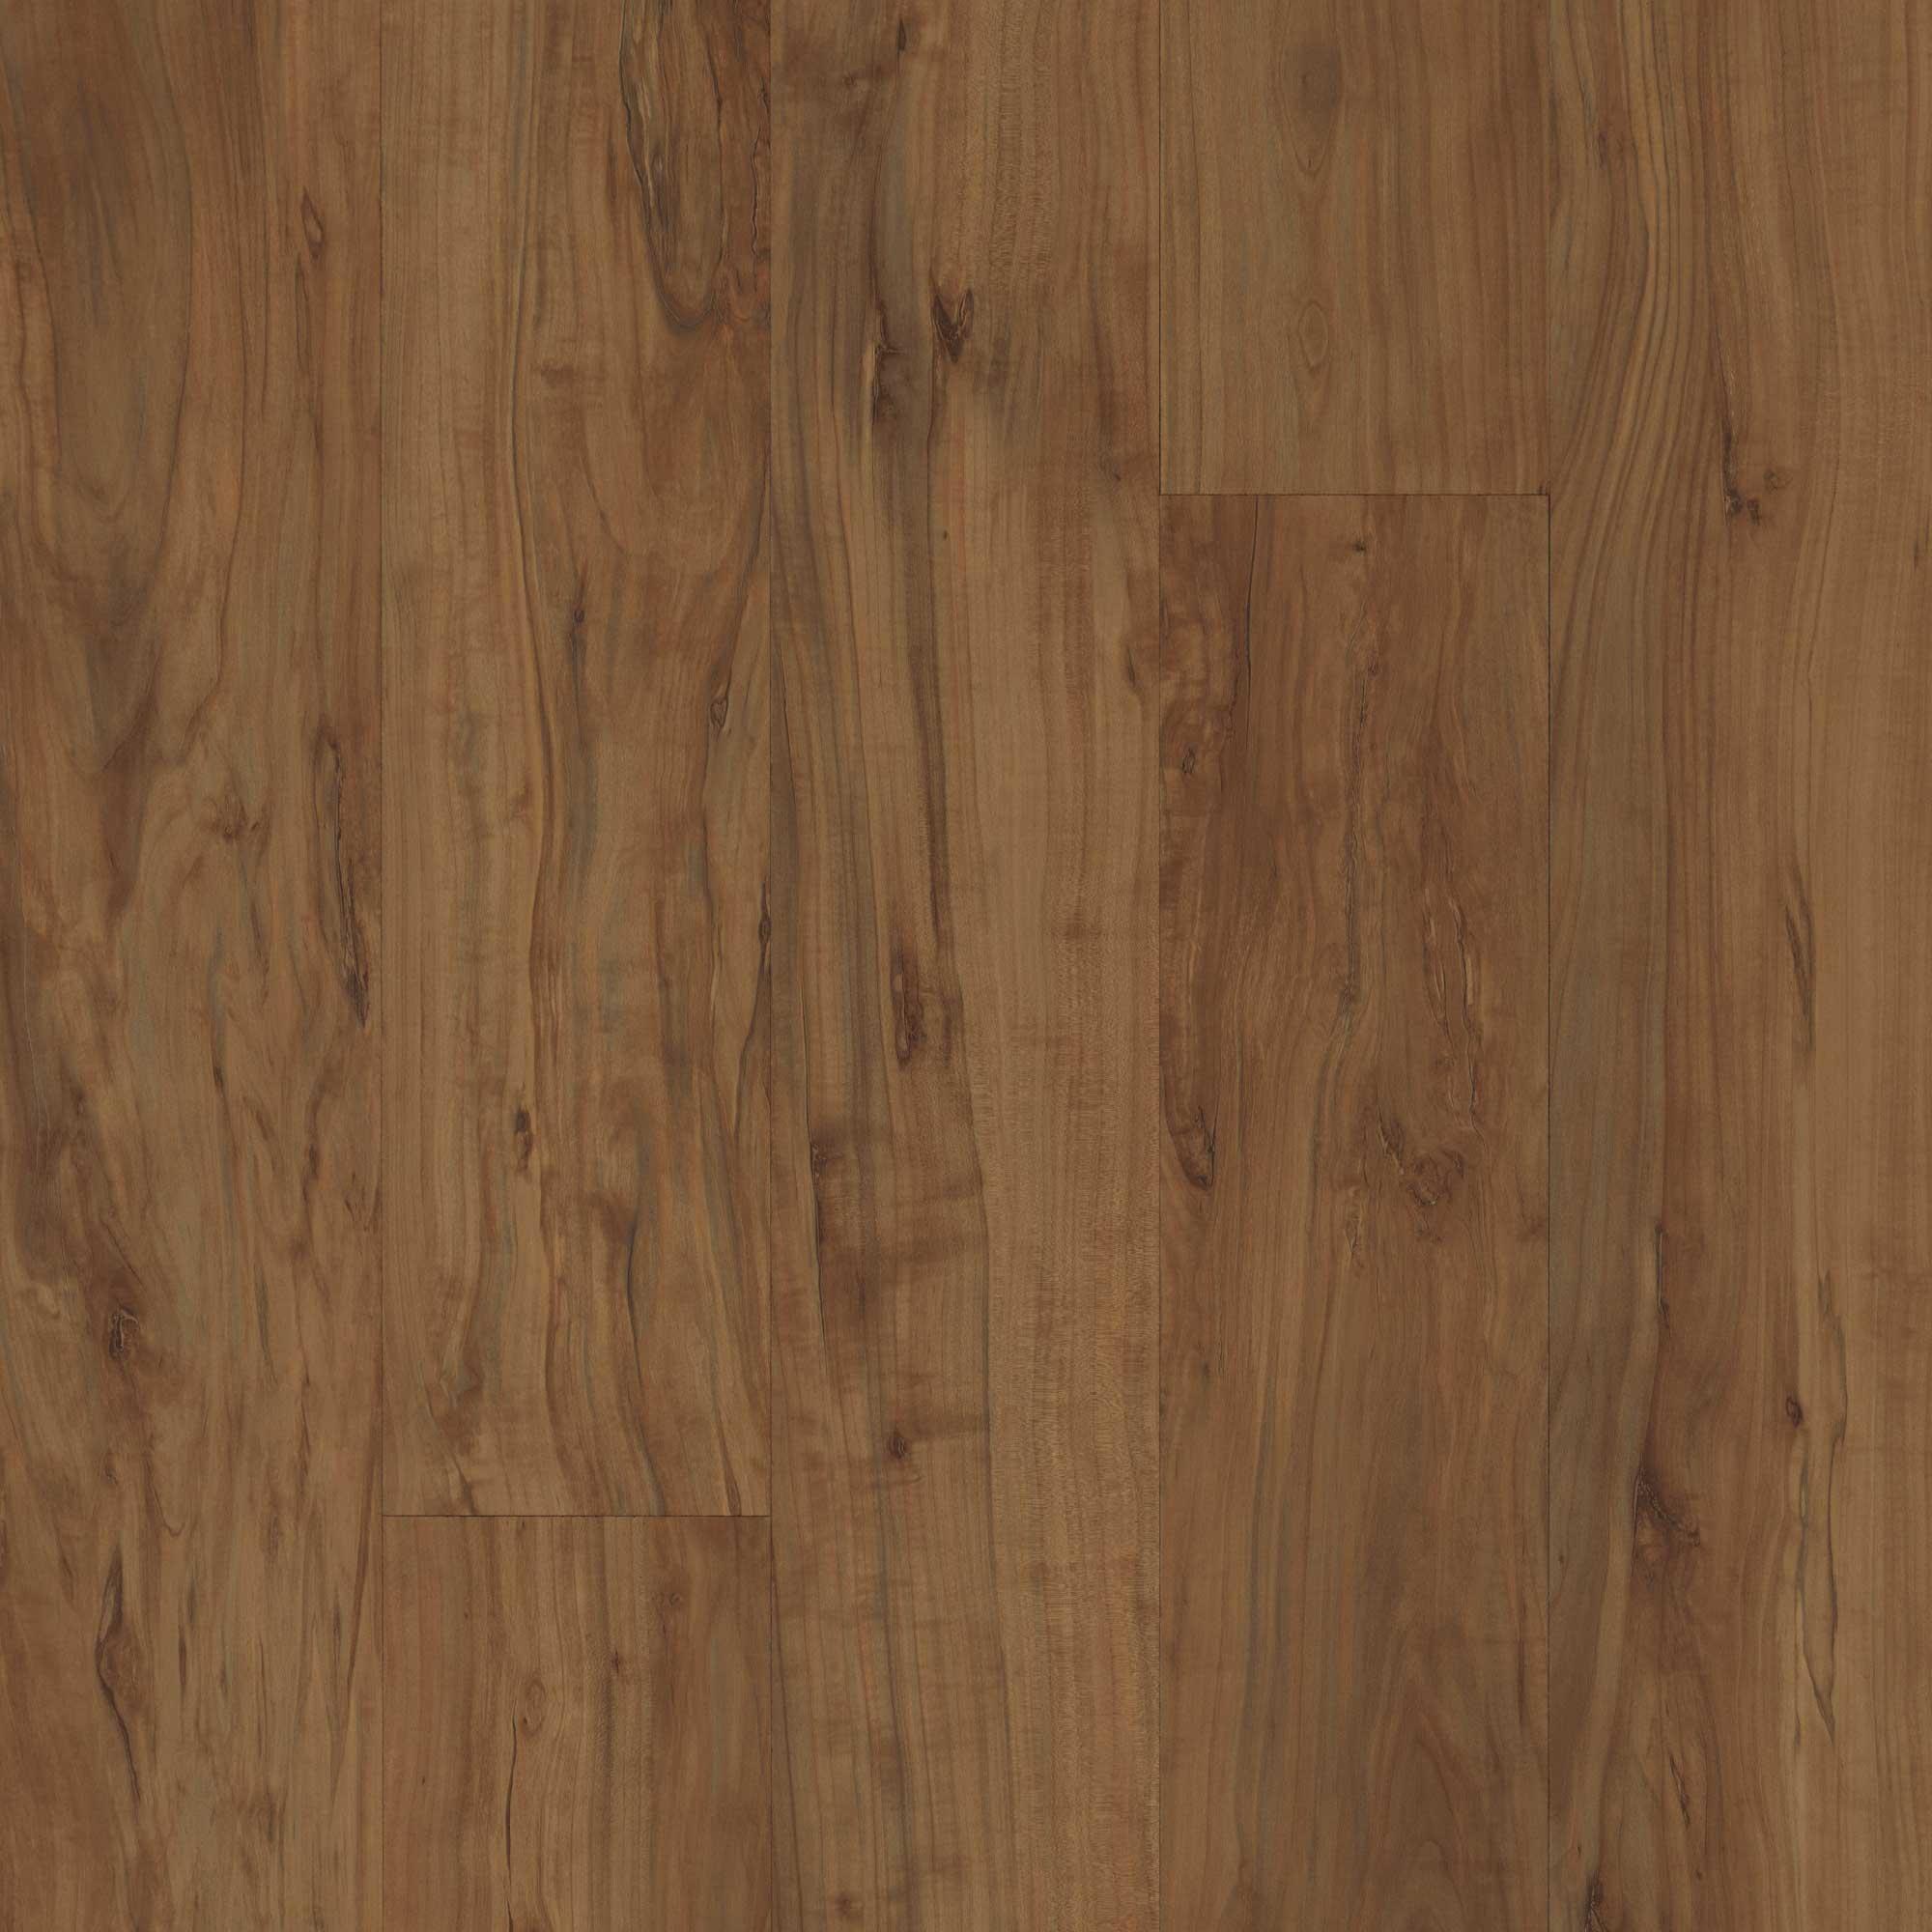 Laminate wood apple wood pergo outlast laminate flooring pergo flooring light grey oak  laminate ACQLTDD